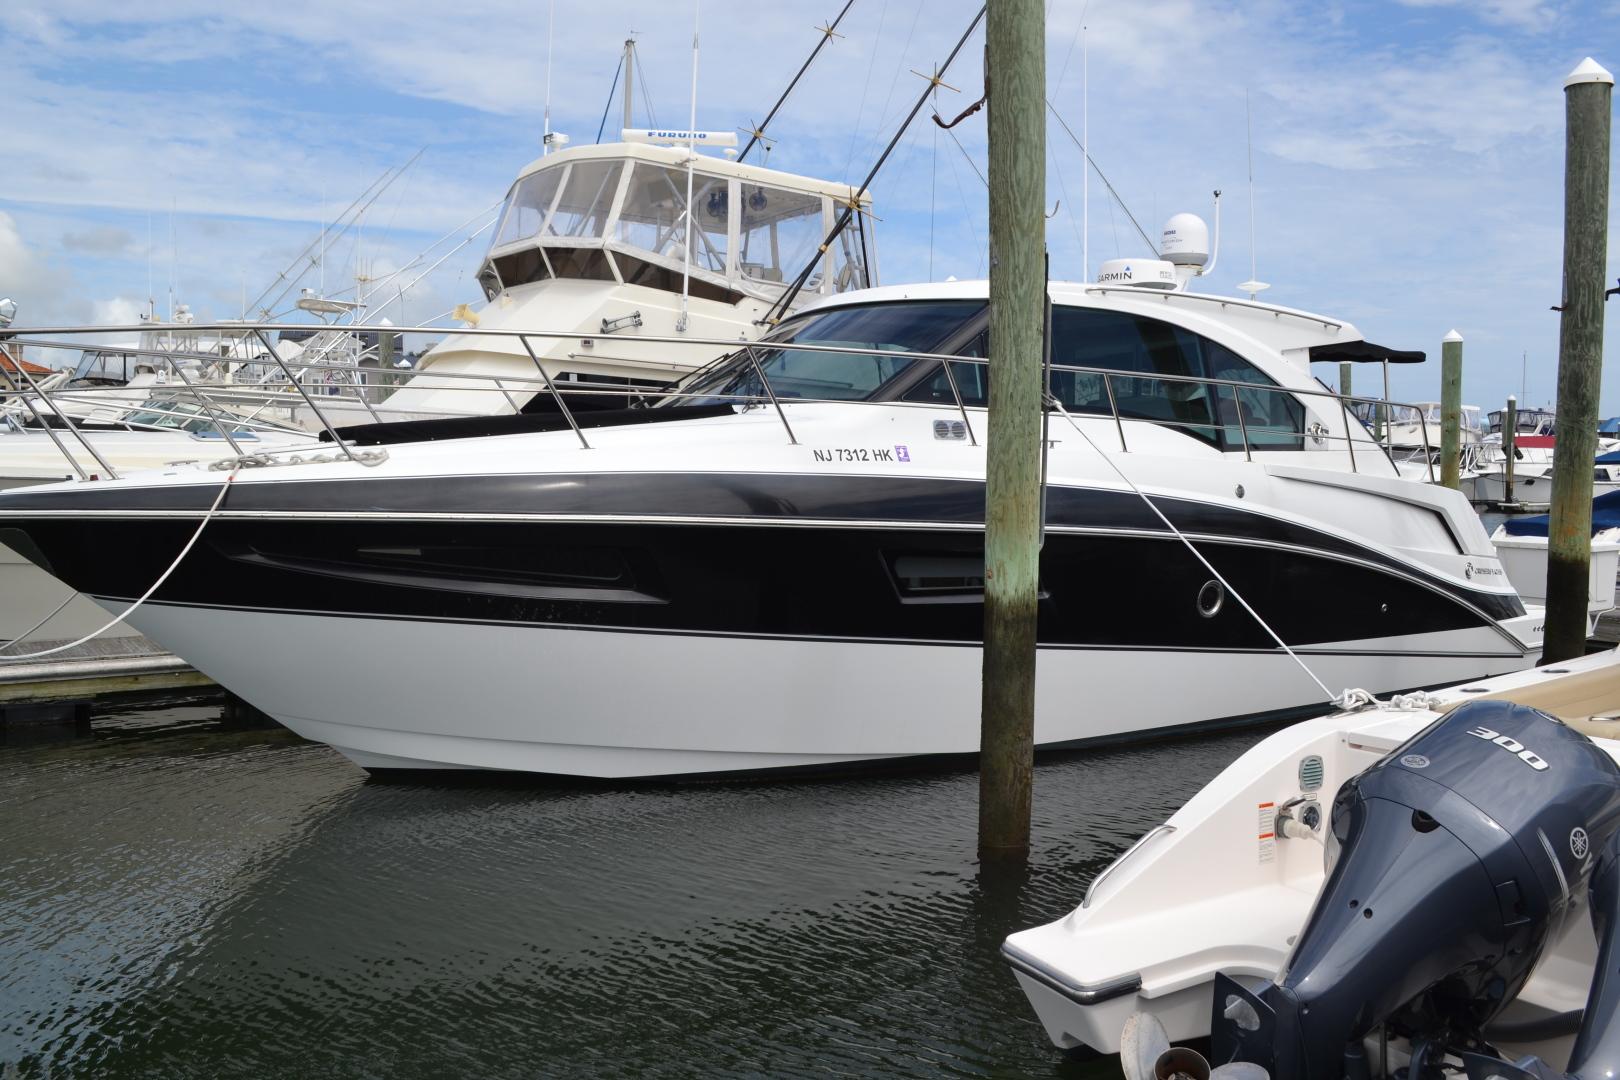 Cruisers-41 Cantius 2016-J&J Shmoozin and Cruzin Annapolis-Maryland-United States-1622219 | Thumbnail